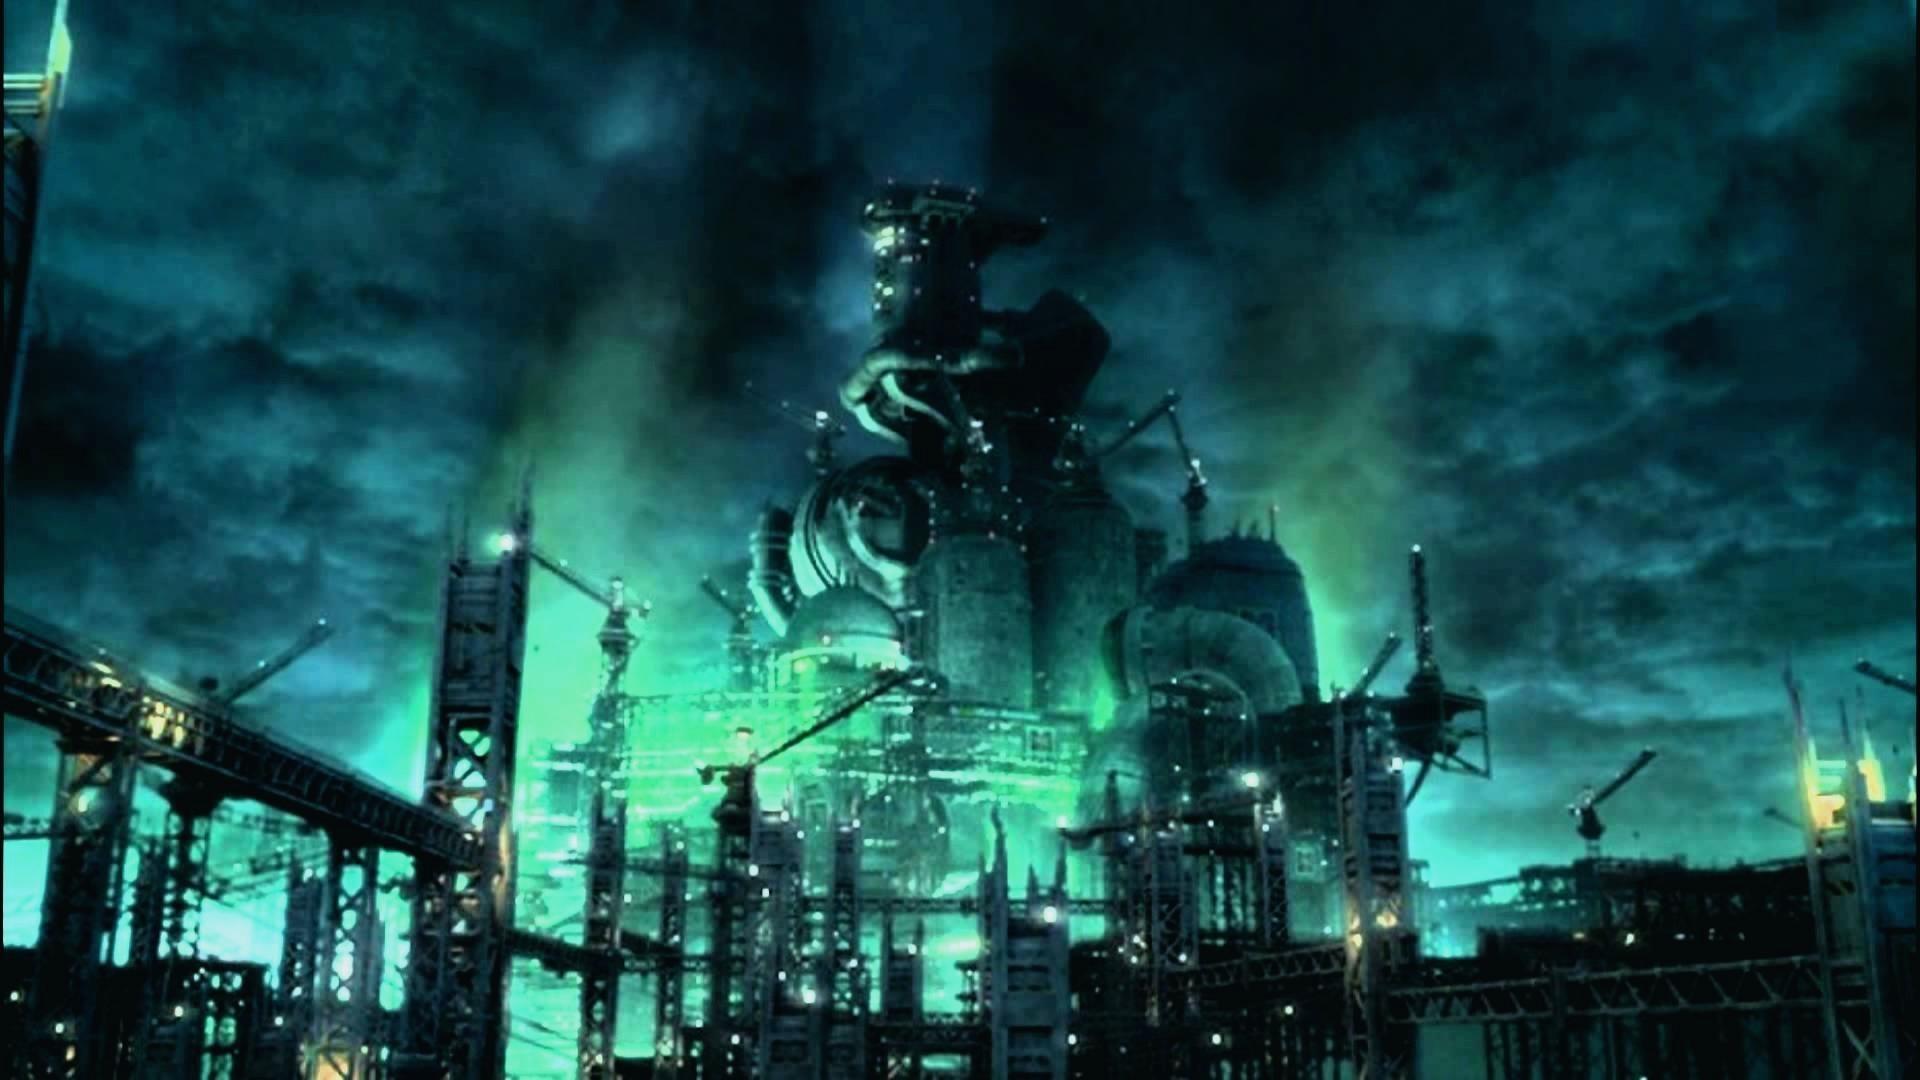 Wallpaperwiki Final Fantasy 7 Backgrounds PIC WPD006860